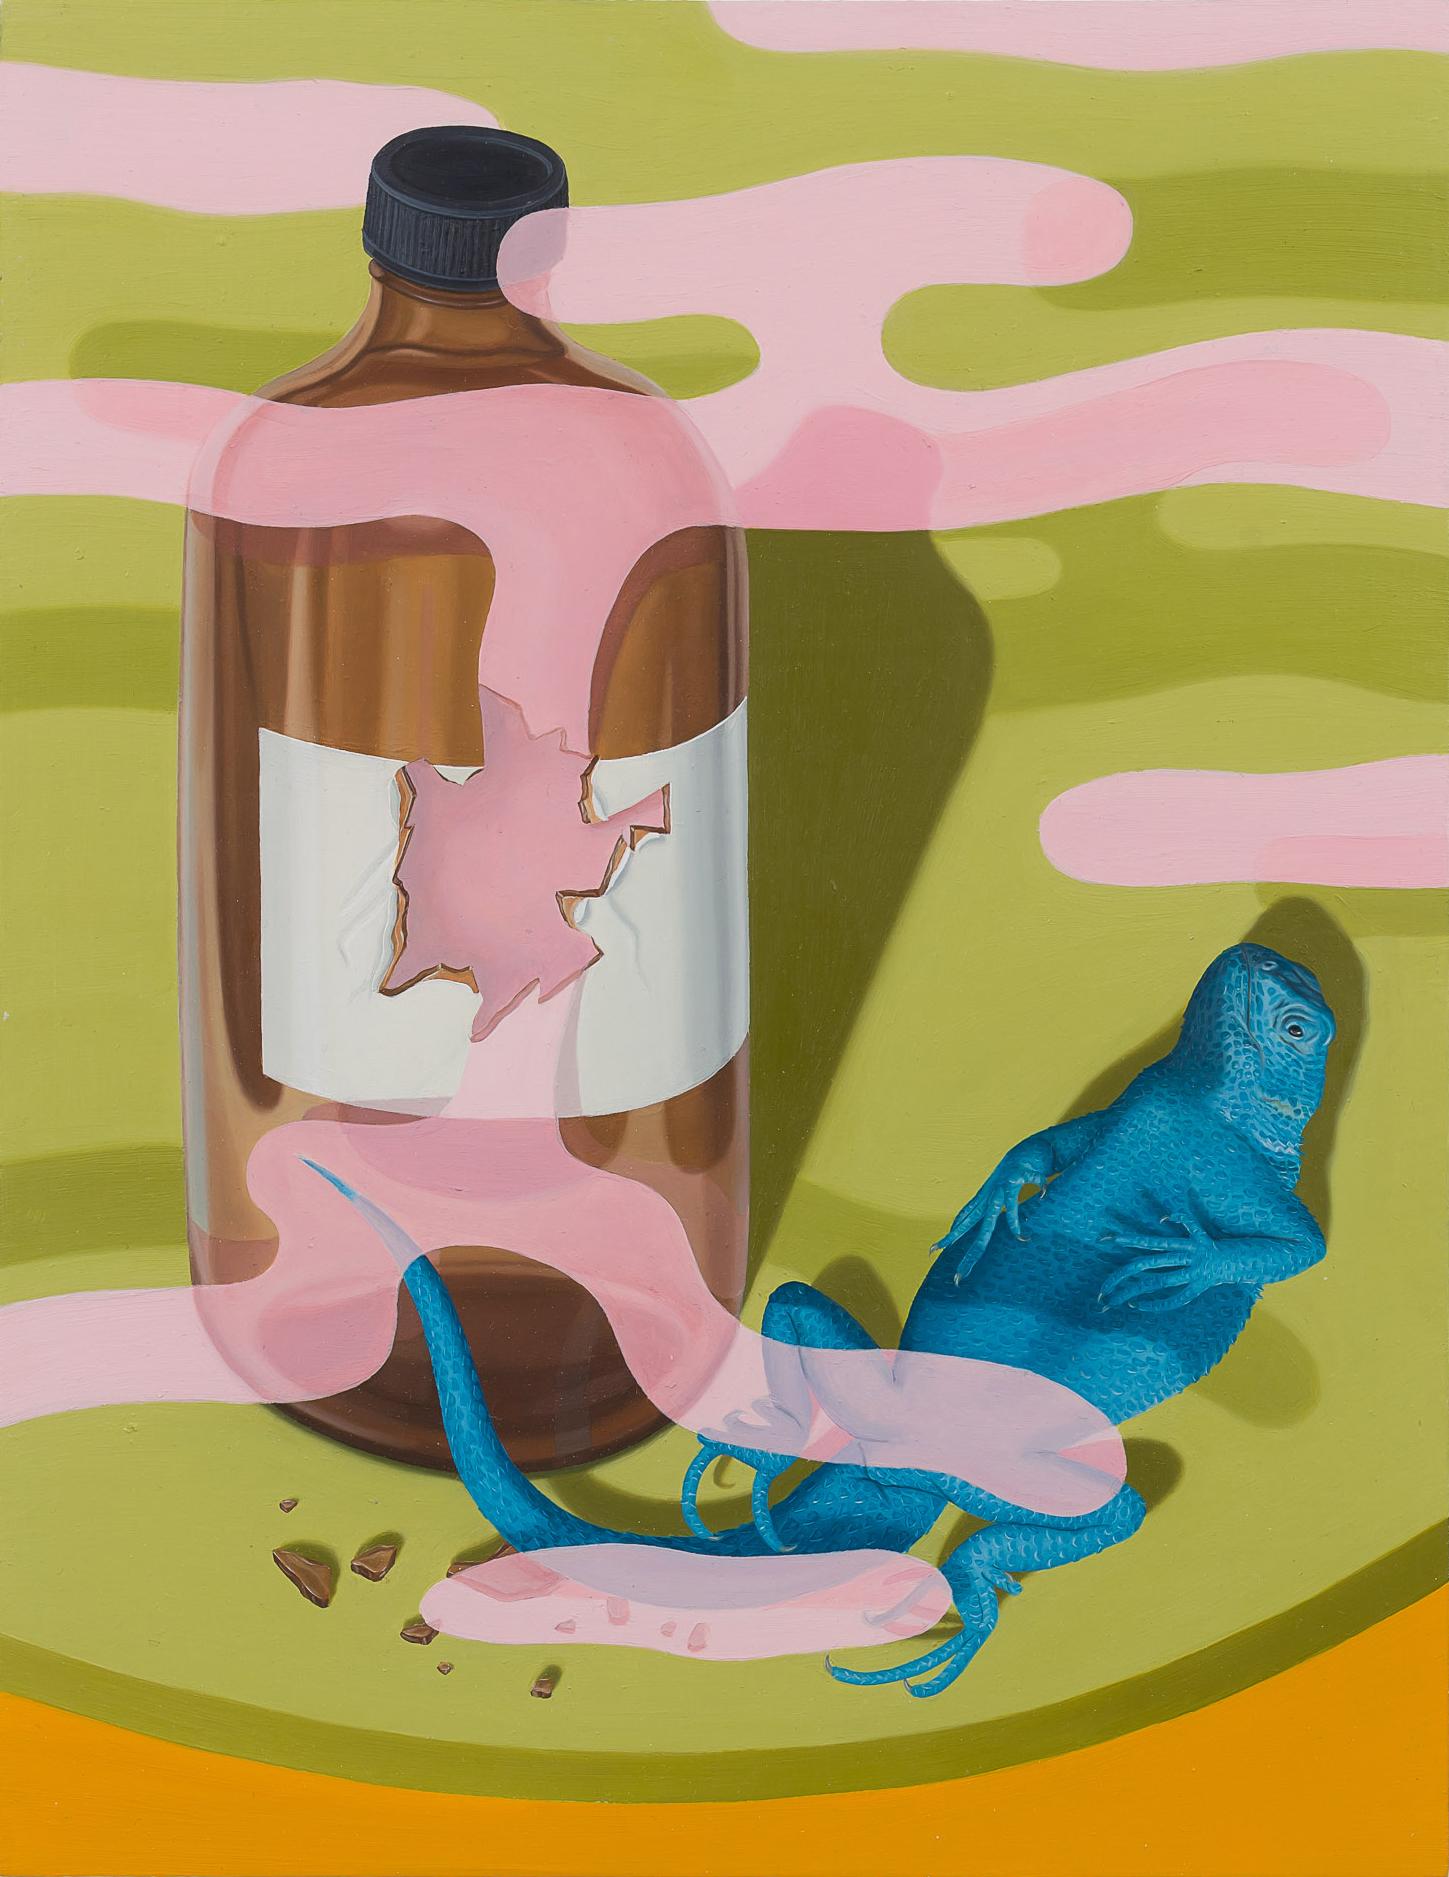 Tristan Pigott   Apparent Death , 2018  Oil on board  27.5 x 21.5 cm